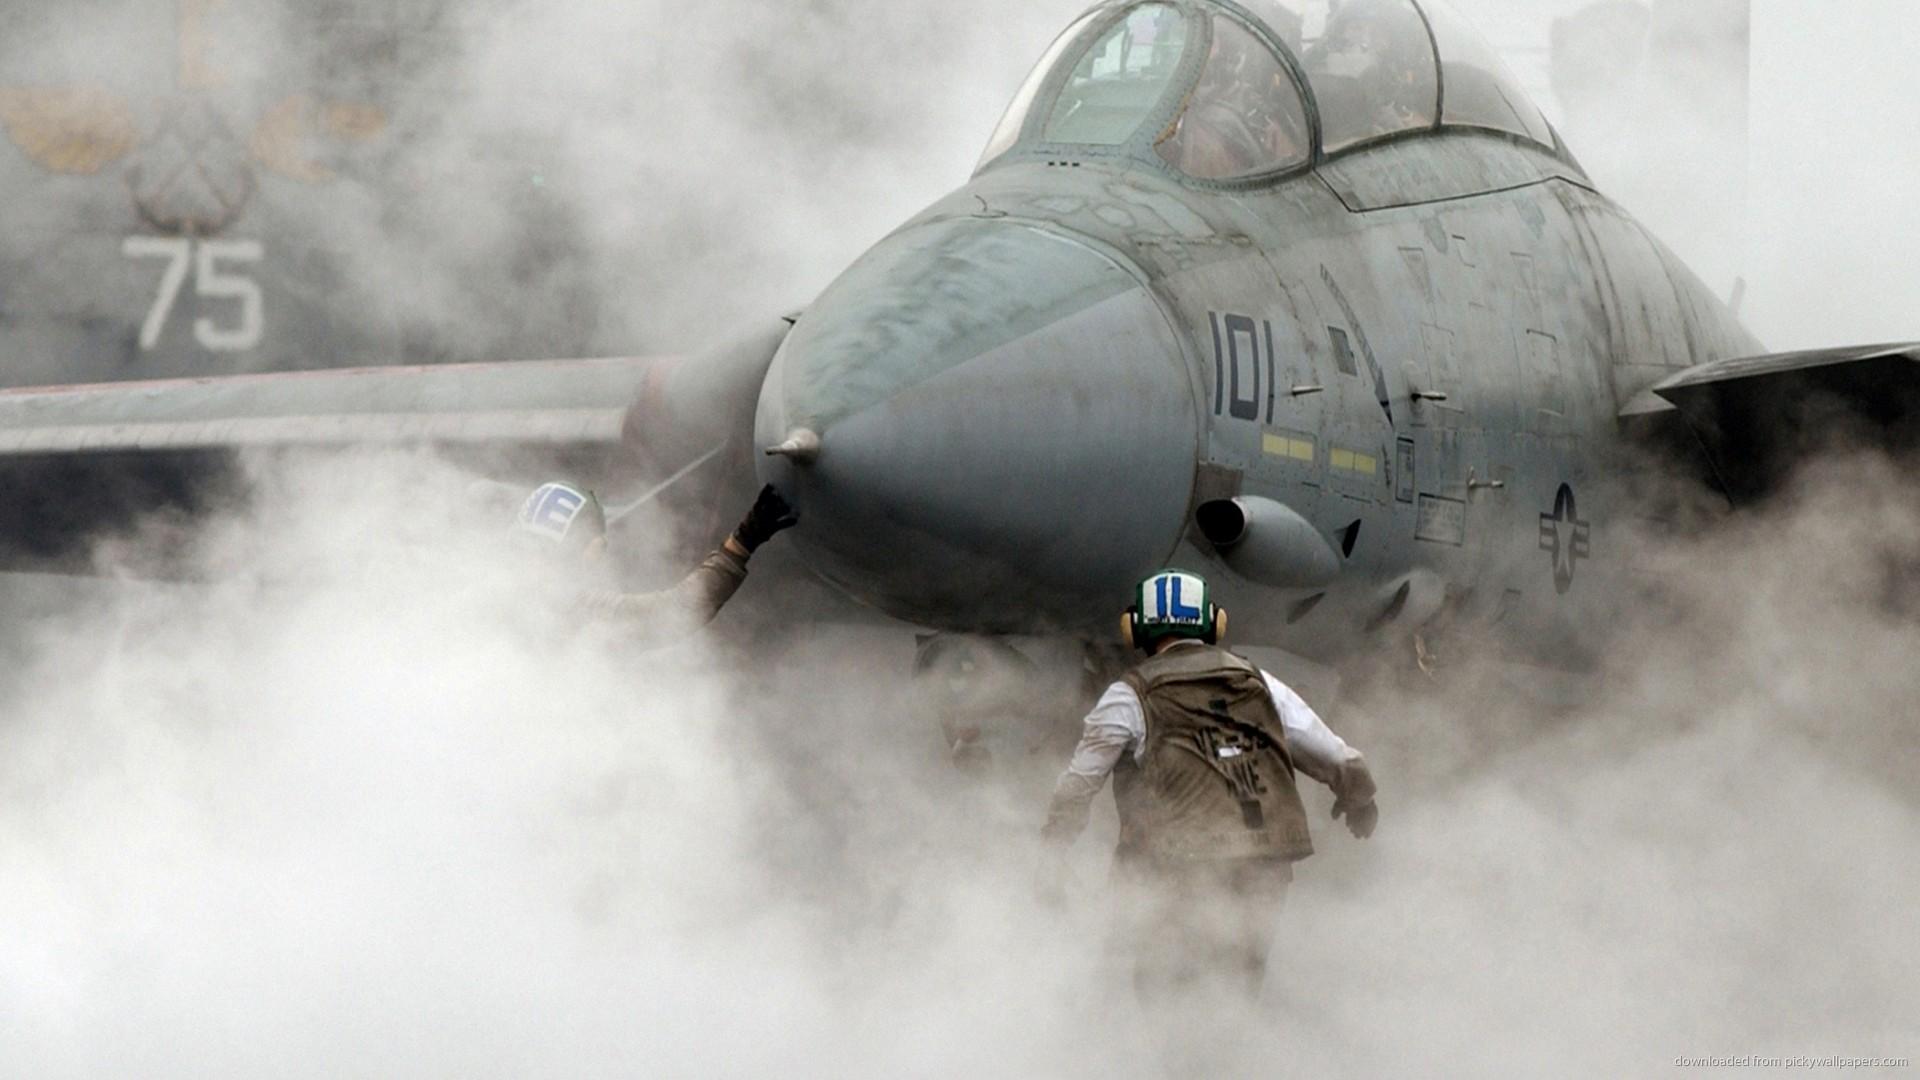 Grumman F-14 Tomcat picture